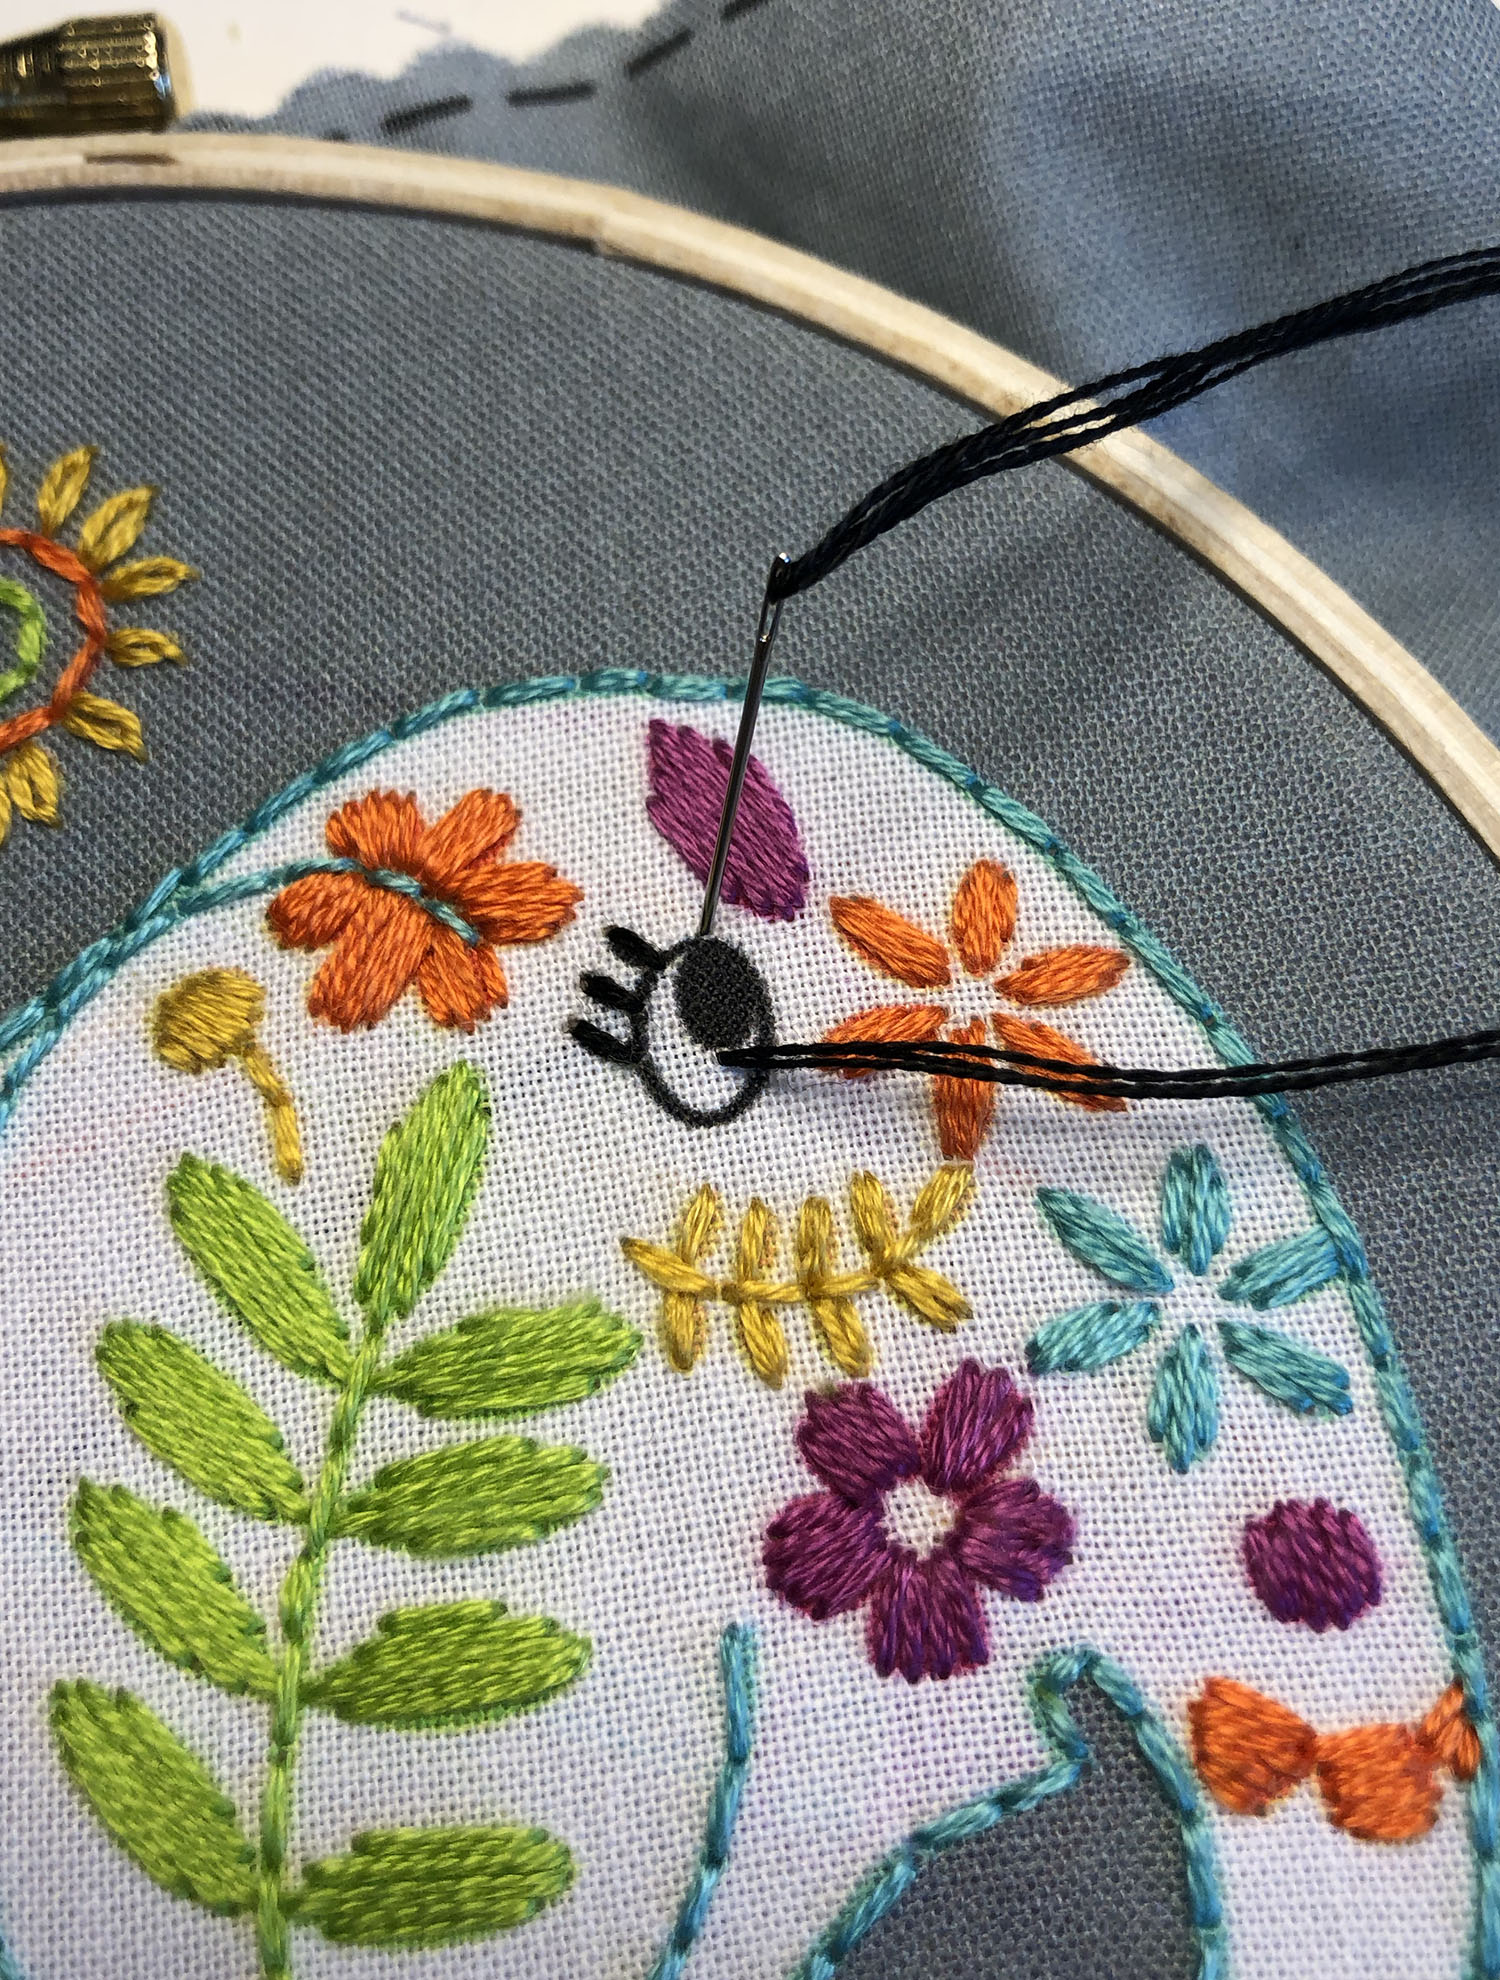 Satin Stitch, Back Stitch outline and single stitch for eyelashes